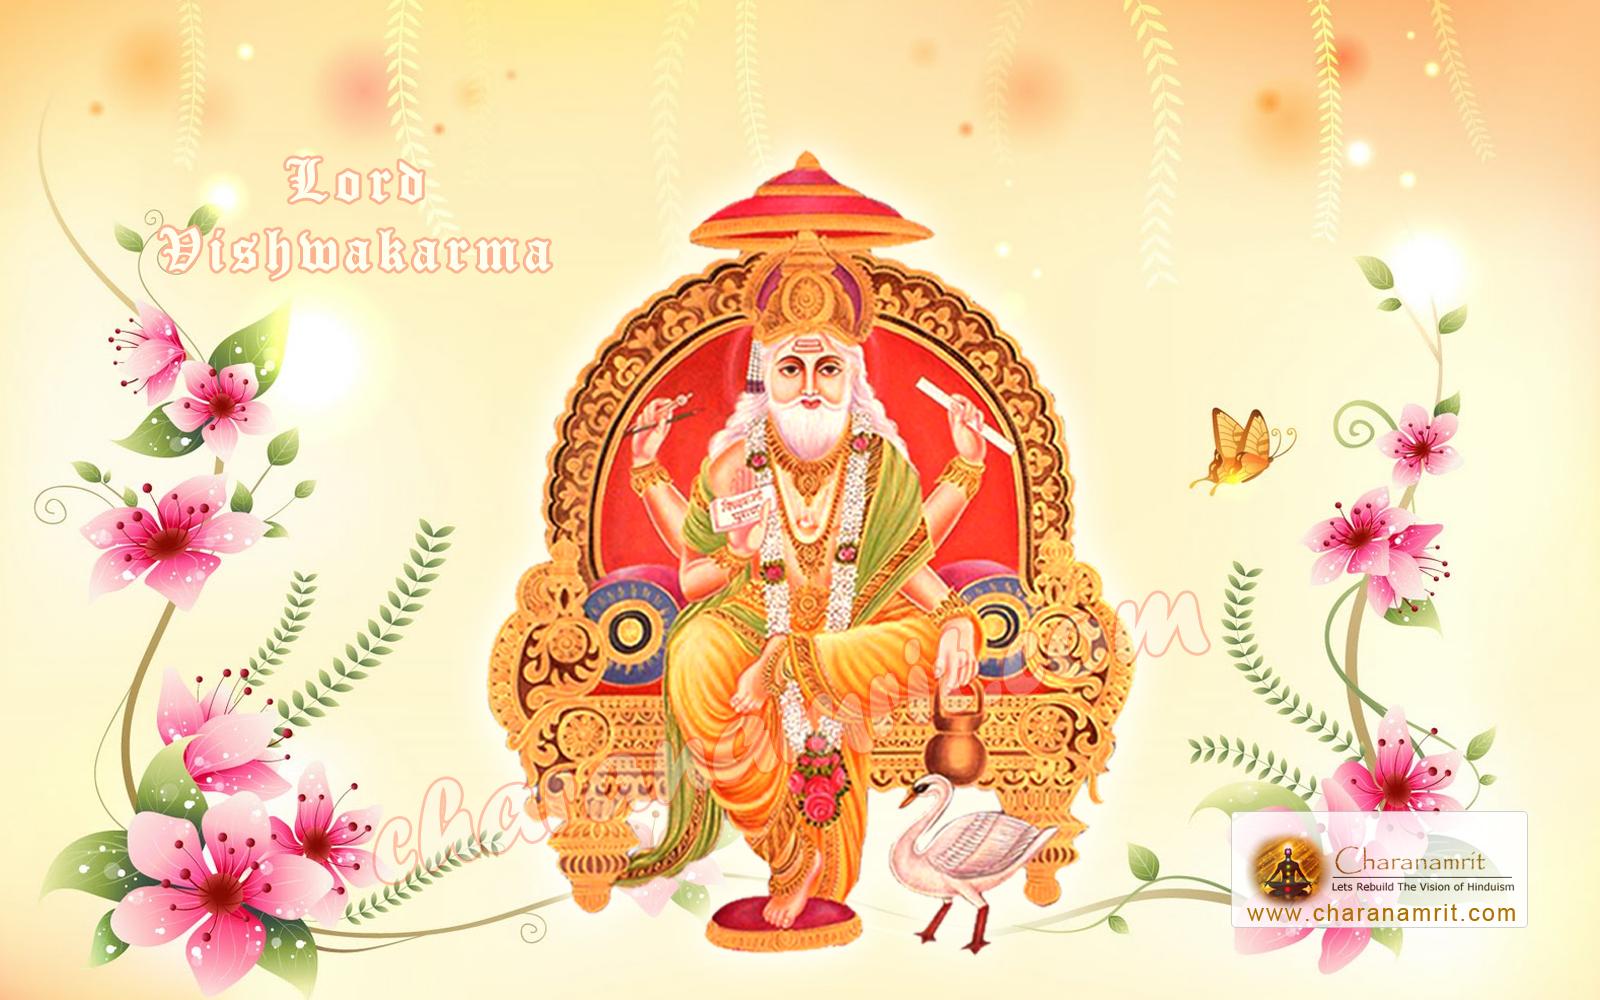 Vishwakarma Puja Images Gif Wallpapers Photos Pics For Whatsapp